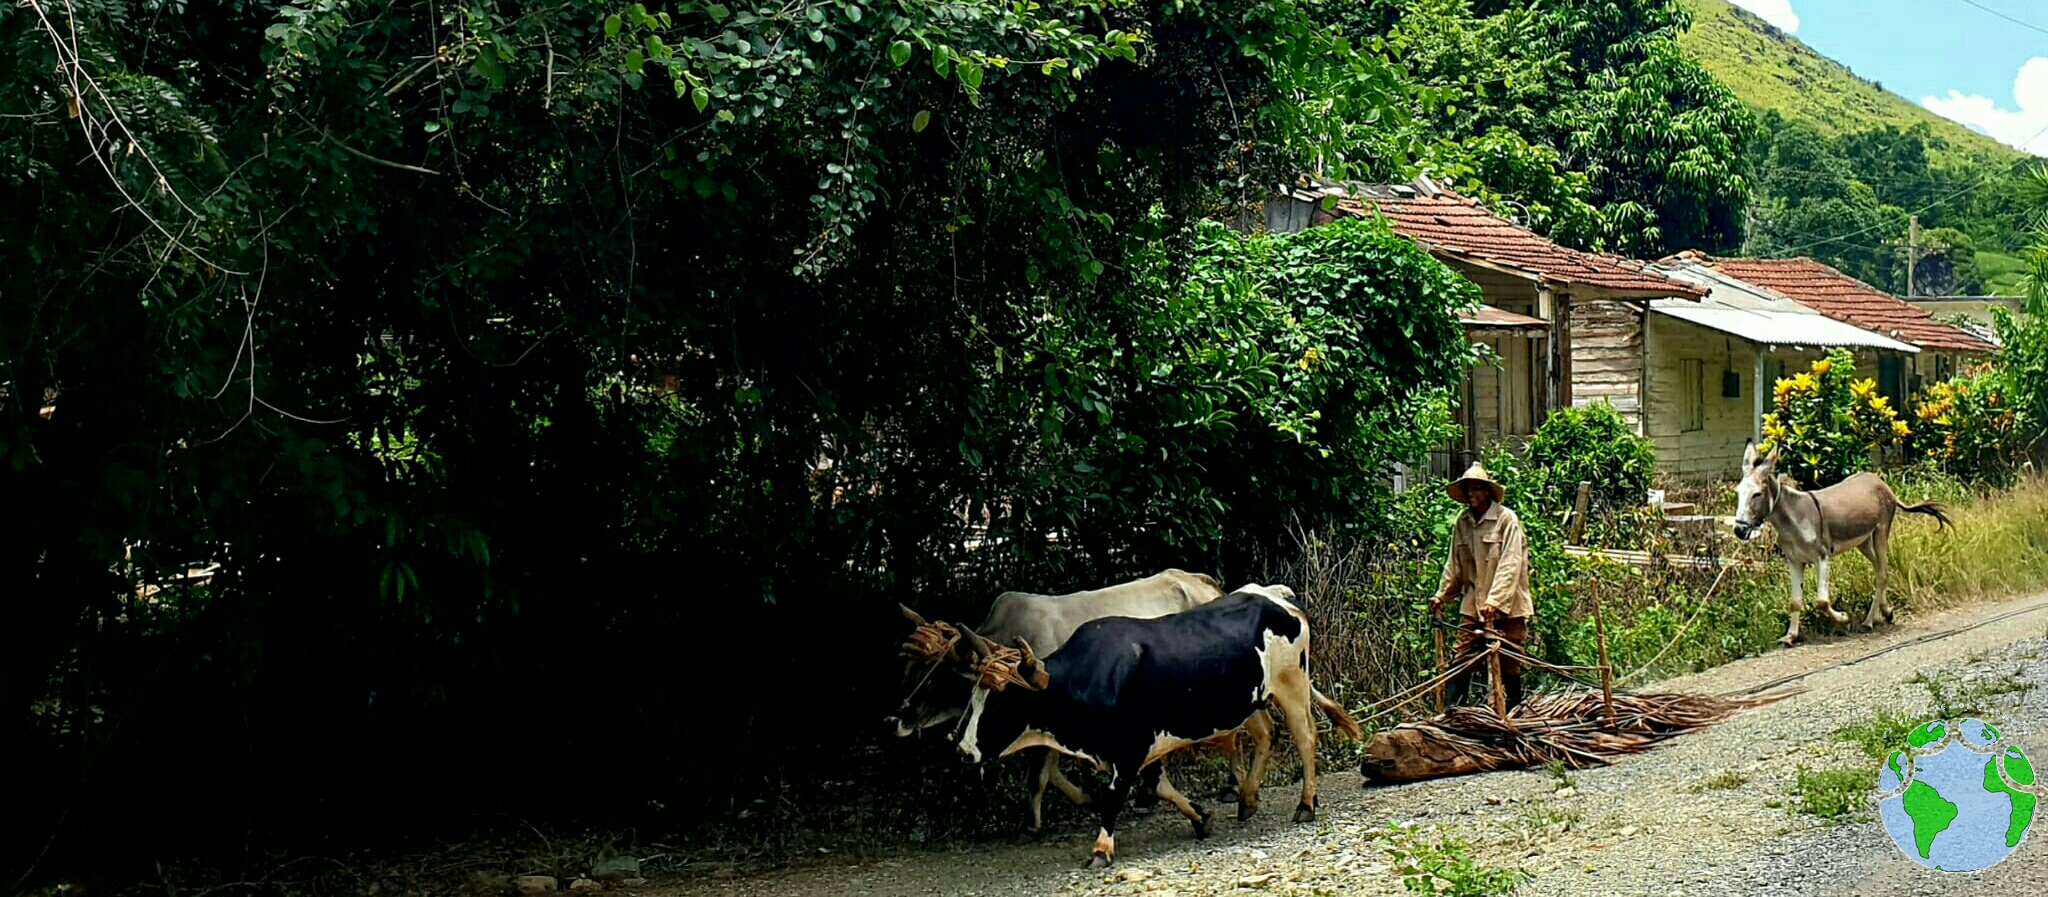 transporte sostenible klm